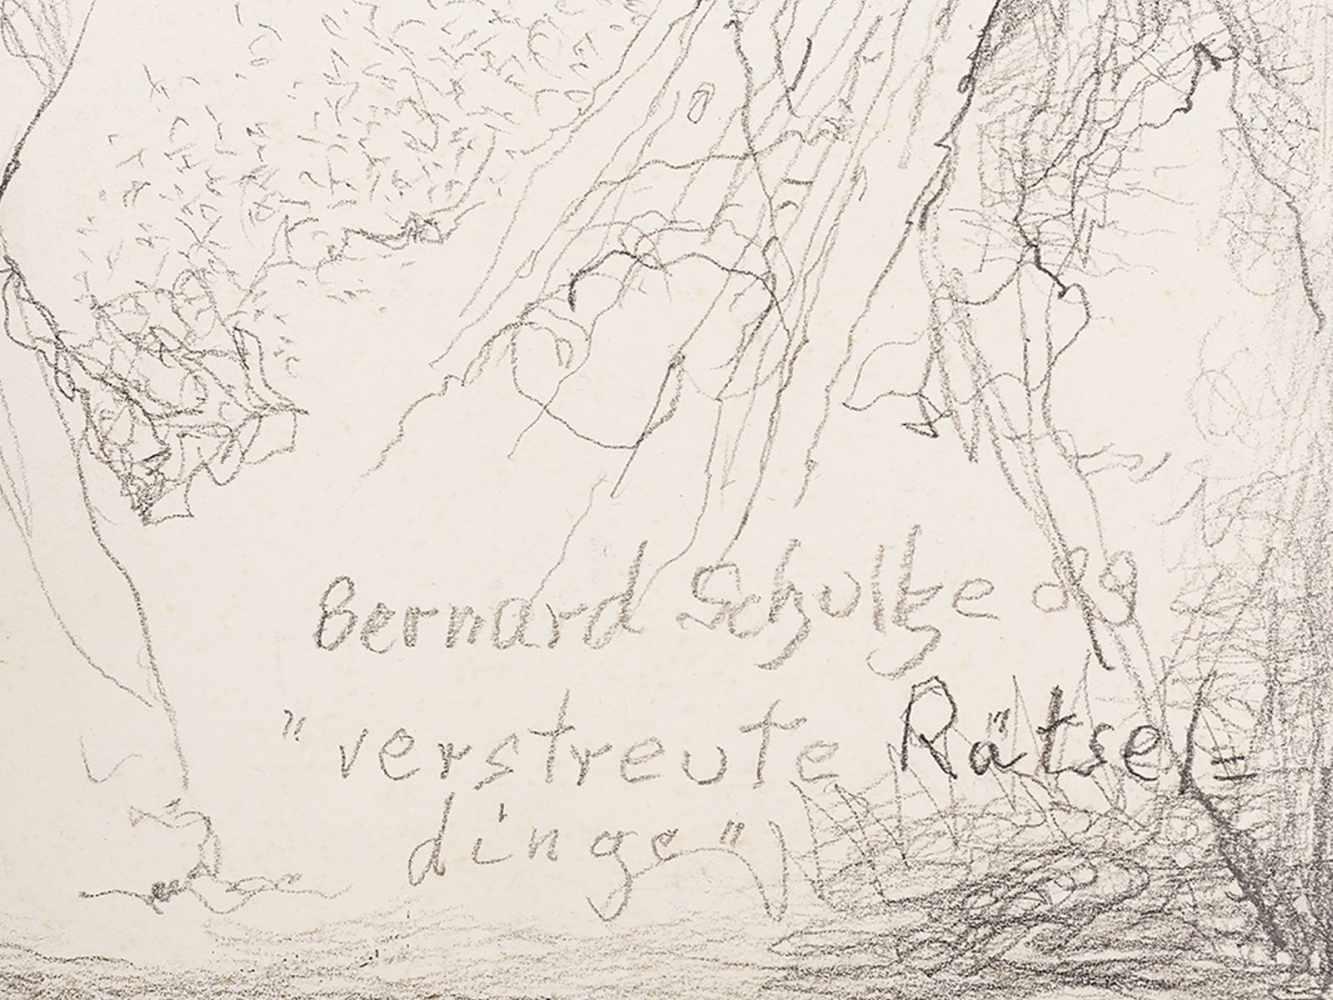 Bernard Schultze (1915-2005), Verstreute Rätseldinge, 1989< - Image 3 of 10